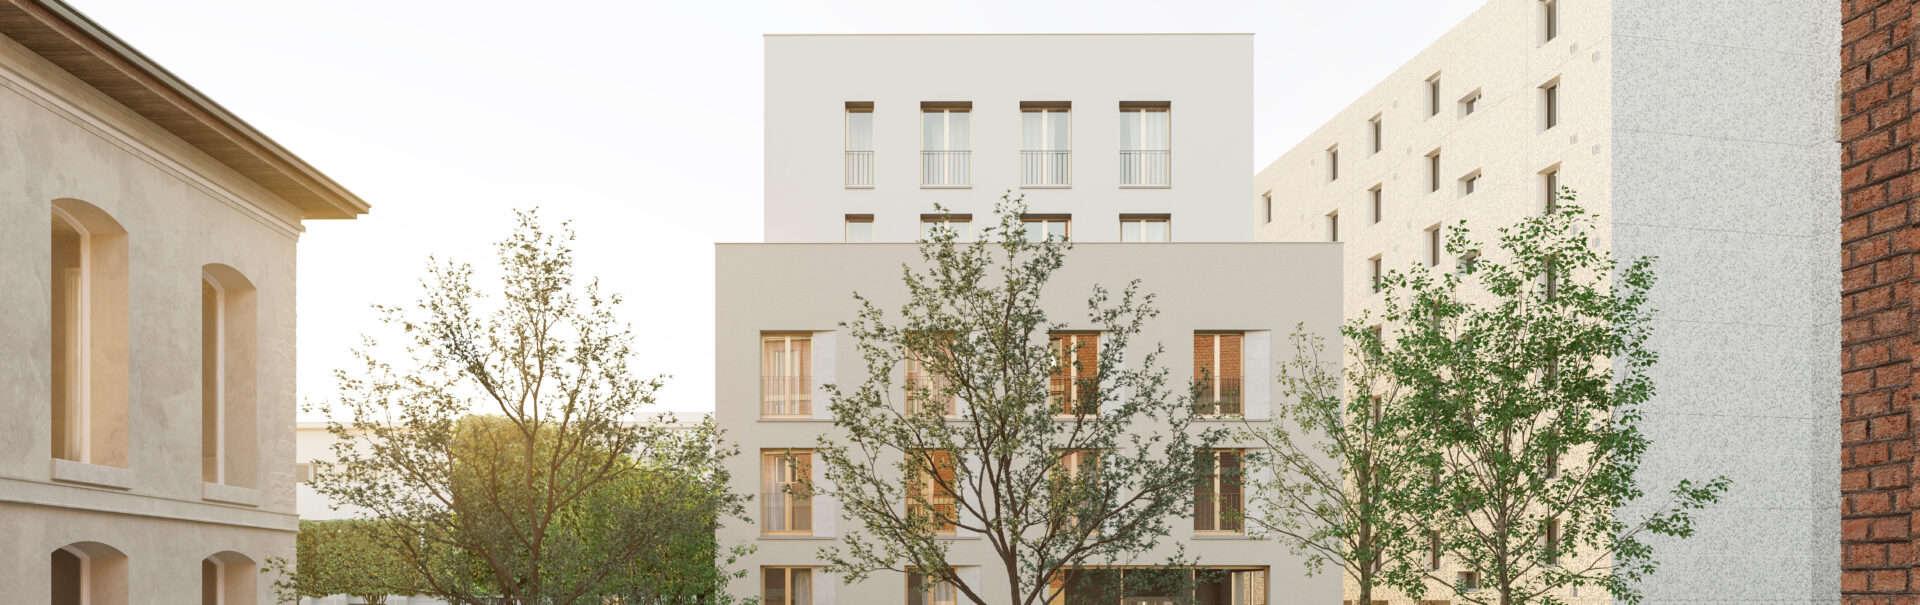 Saroam Arcueil Place Hd